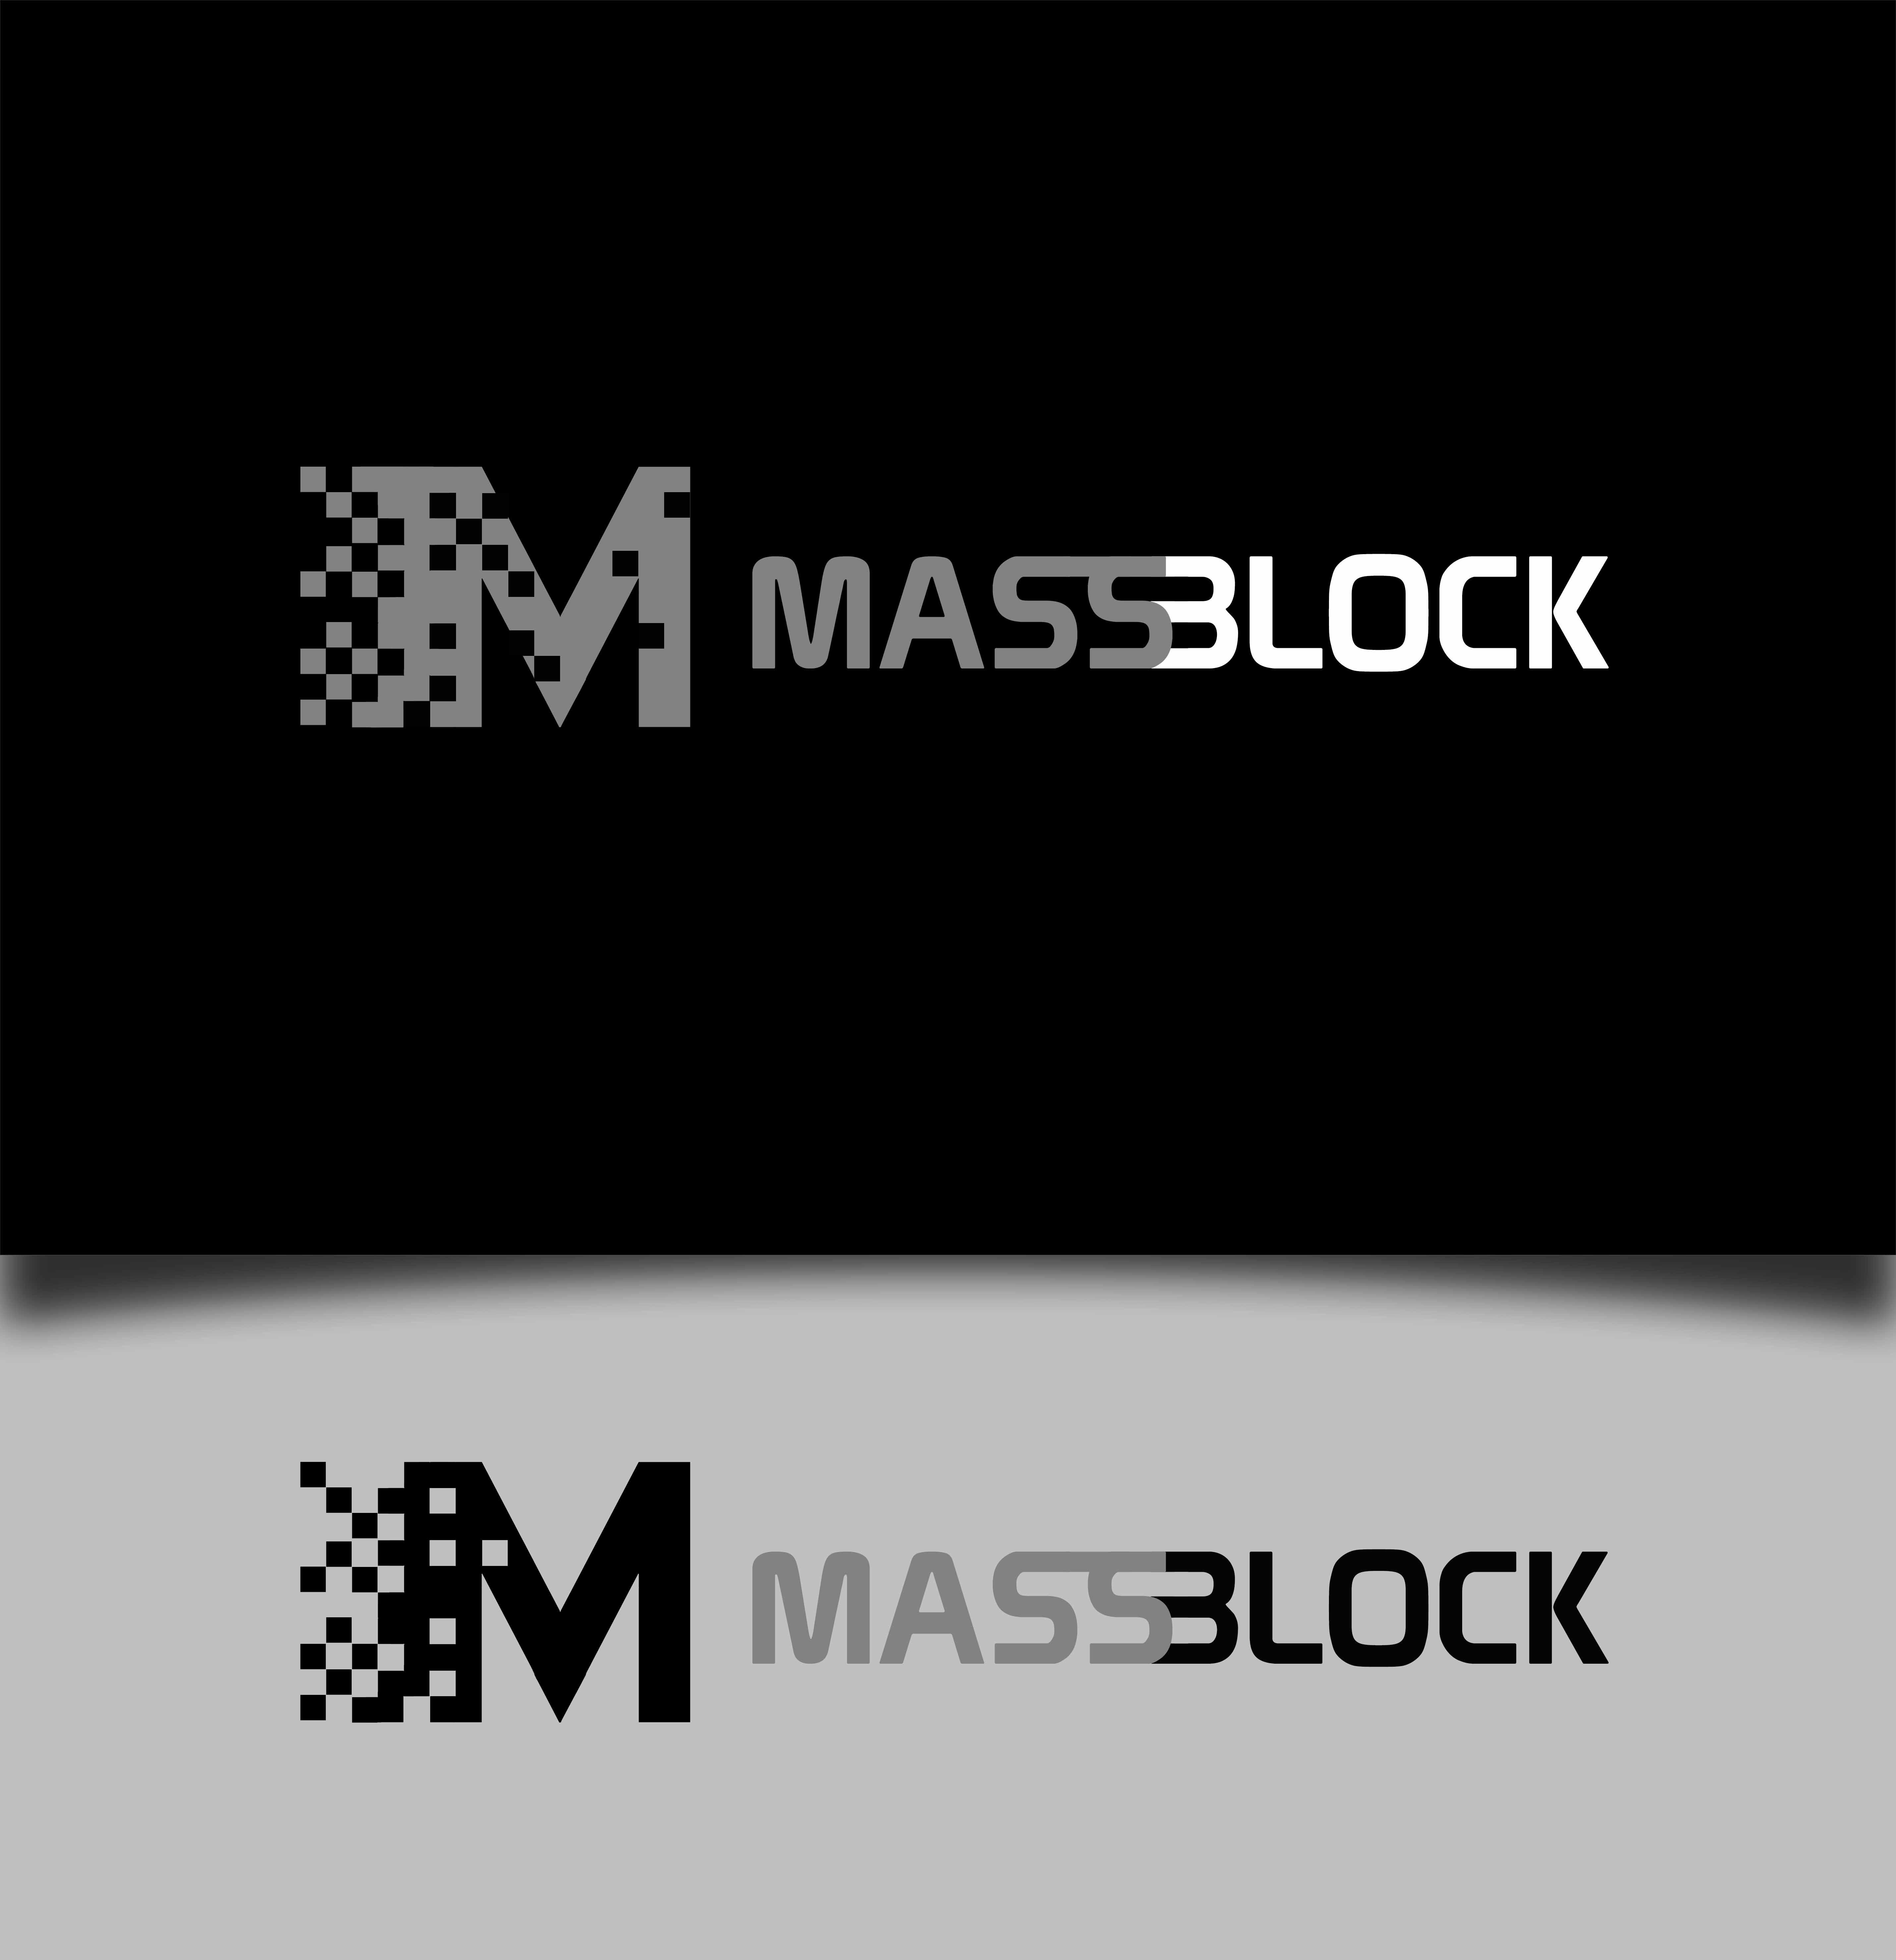 Logo Design by JSDESIGNGROUP - Entry No. 8 in the Logo Design Contest Fun Logo Design for Massblock.